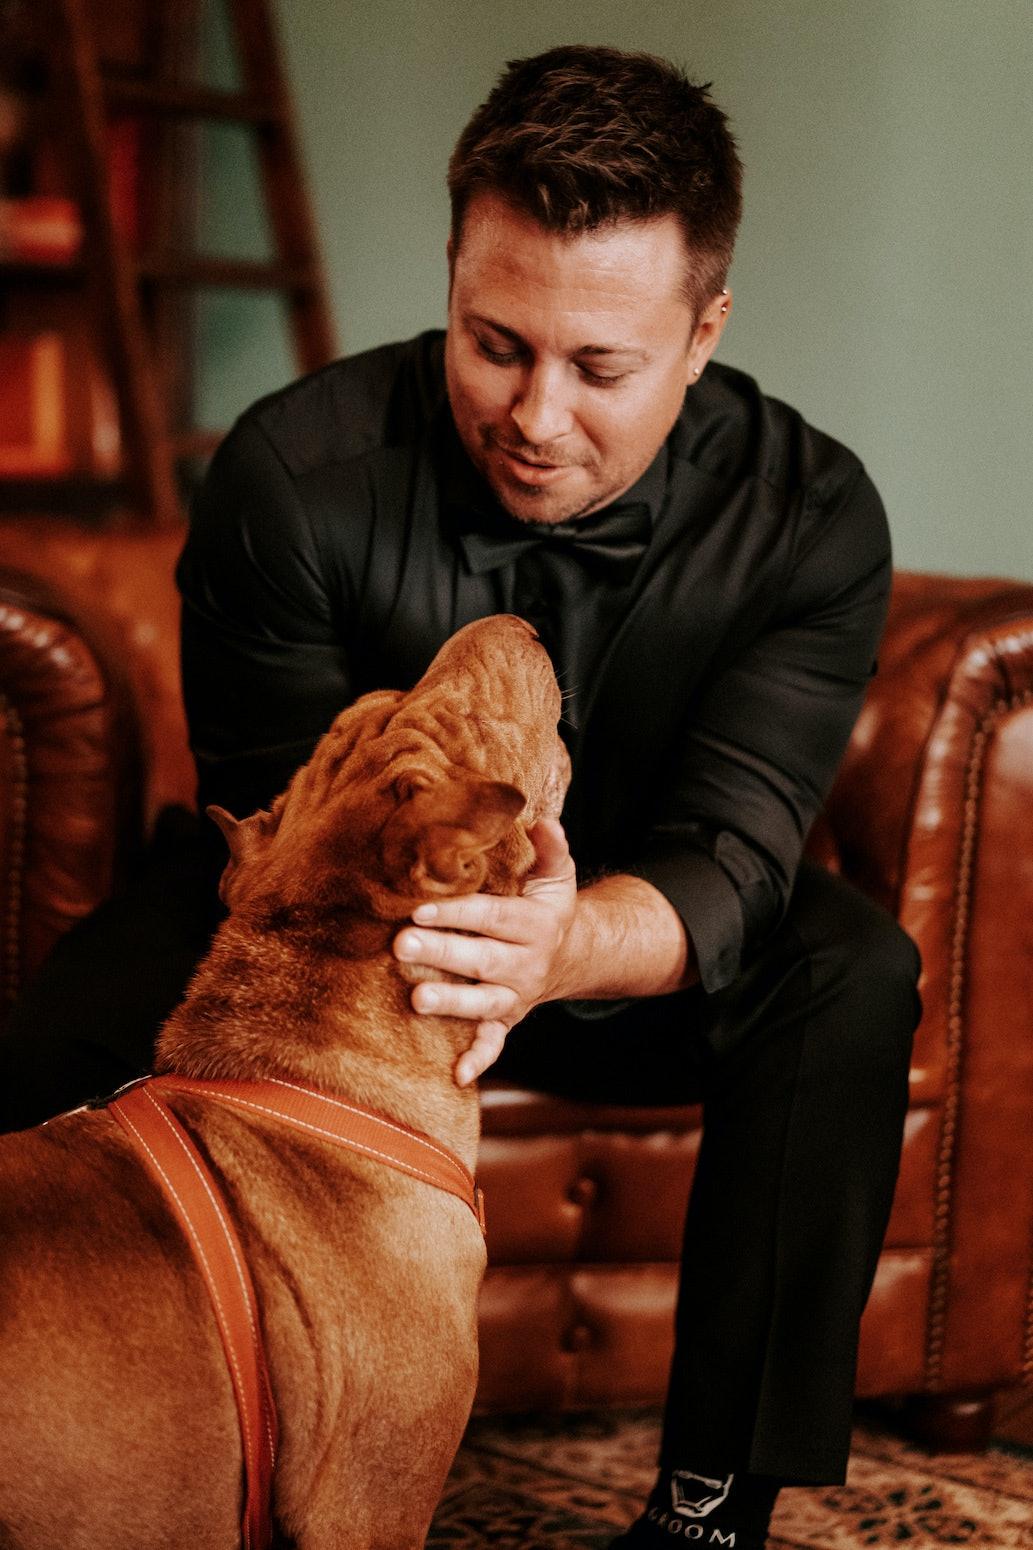 Groom petting dog